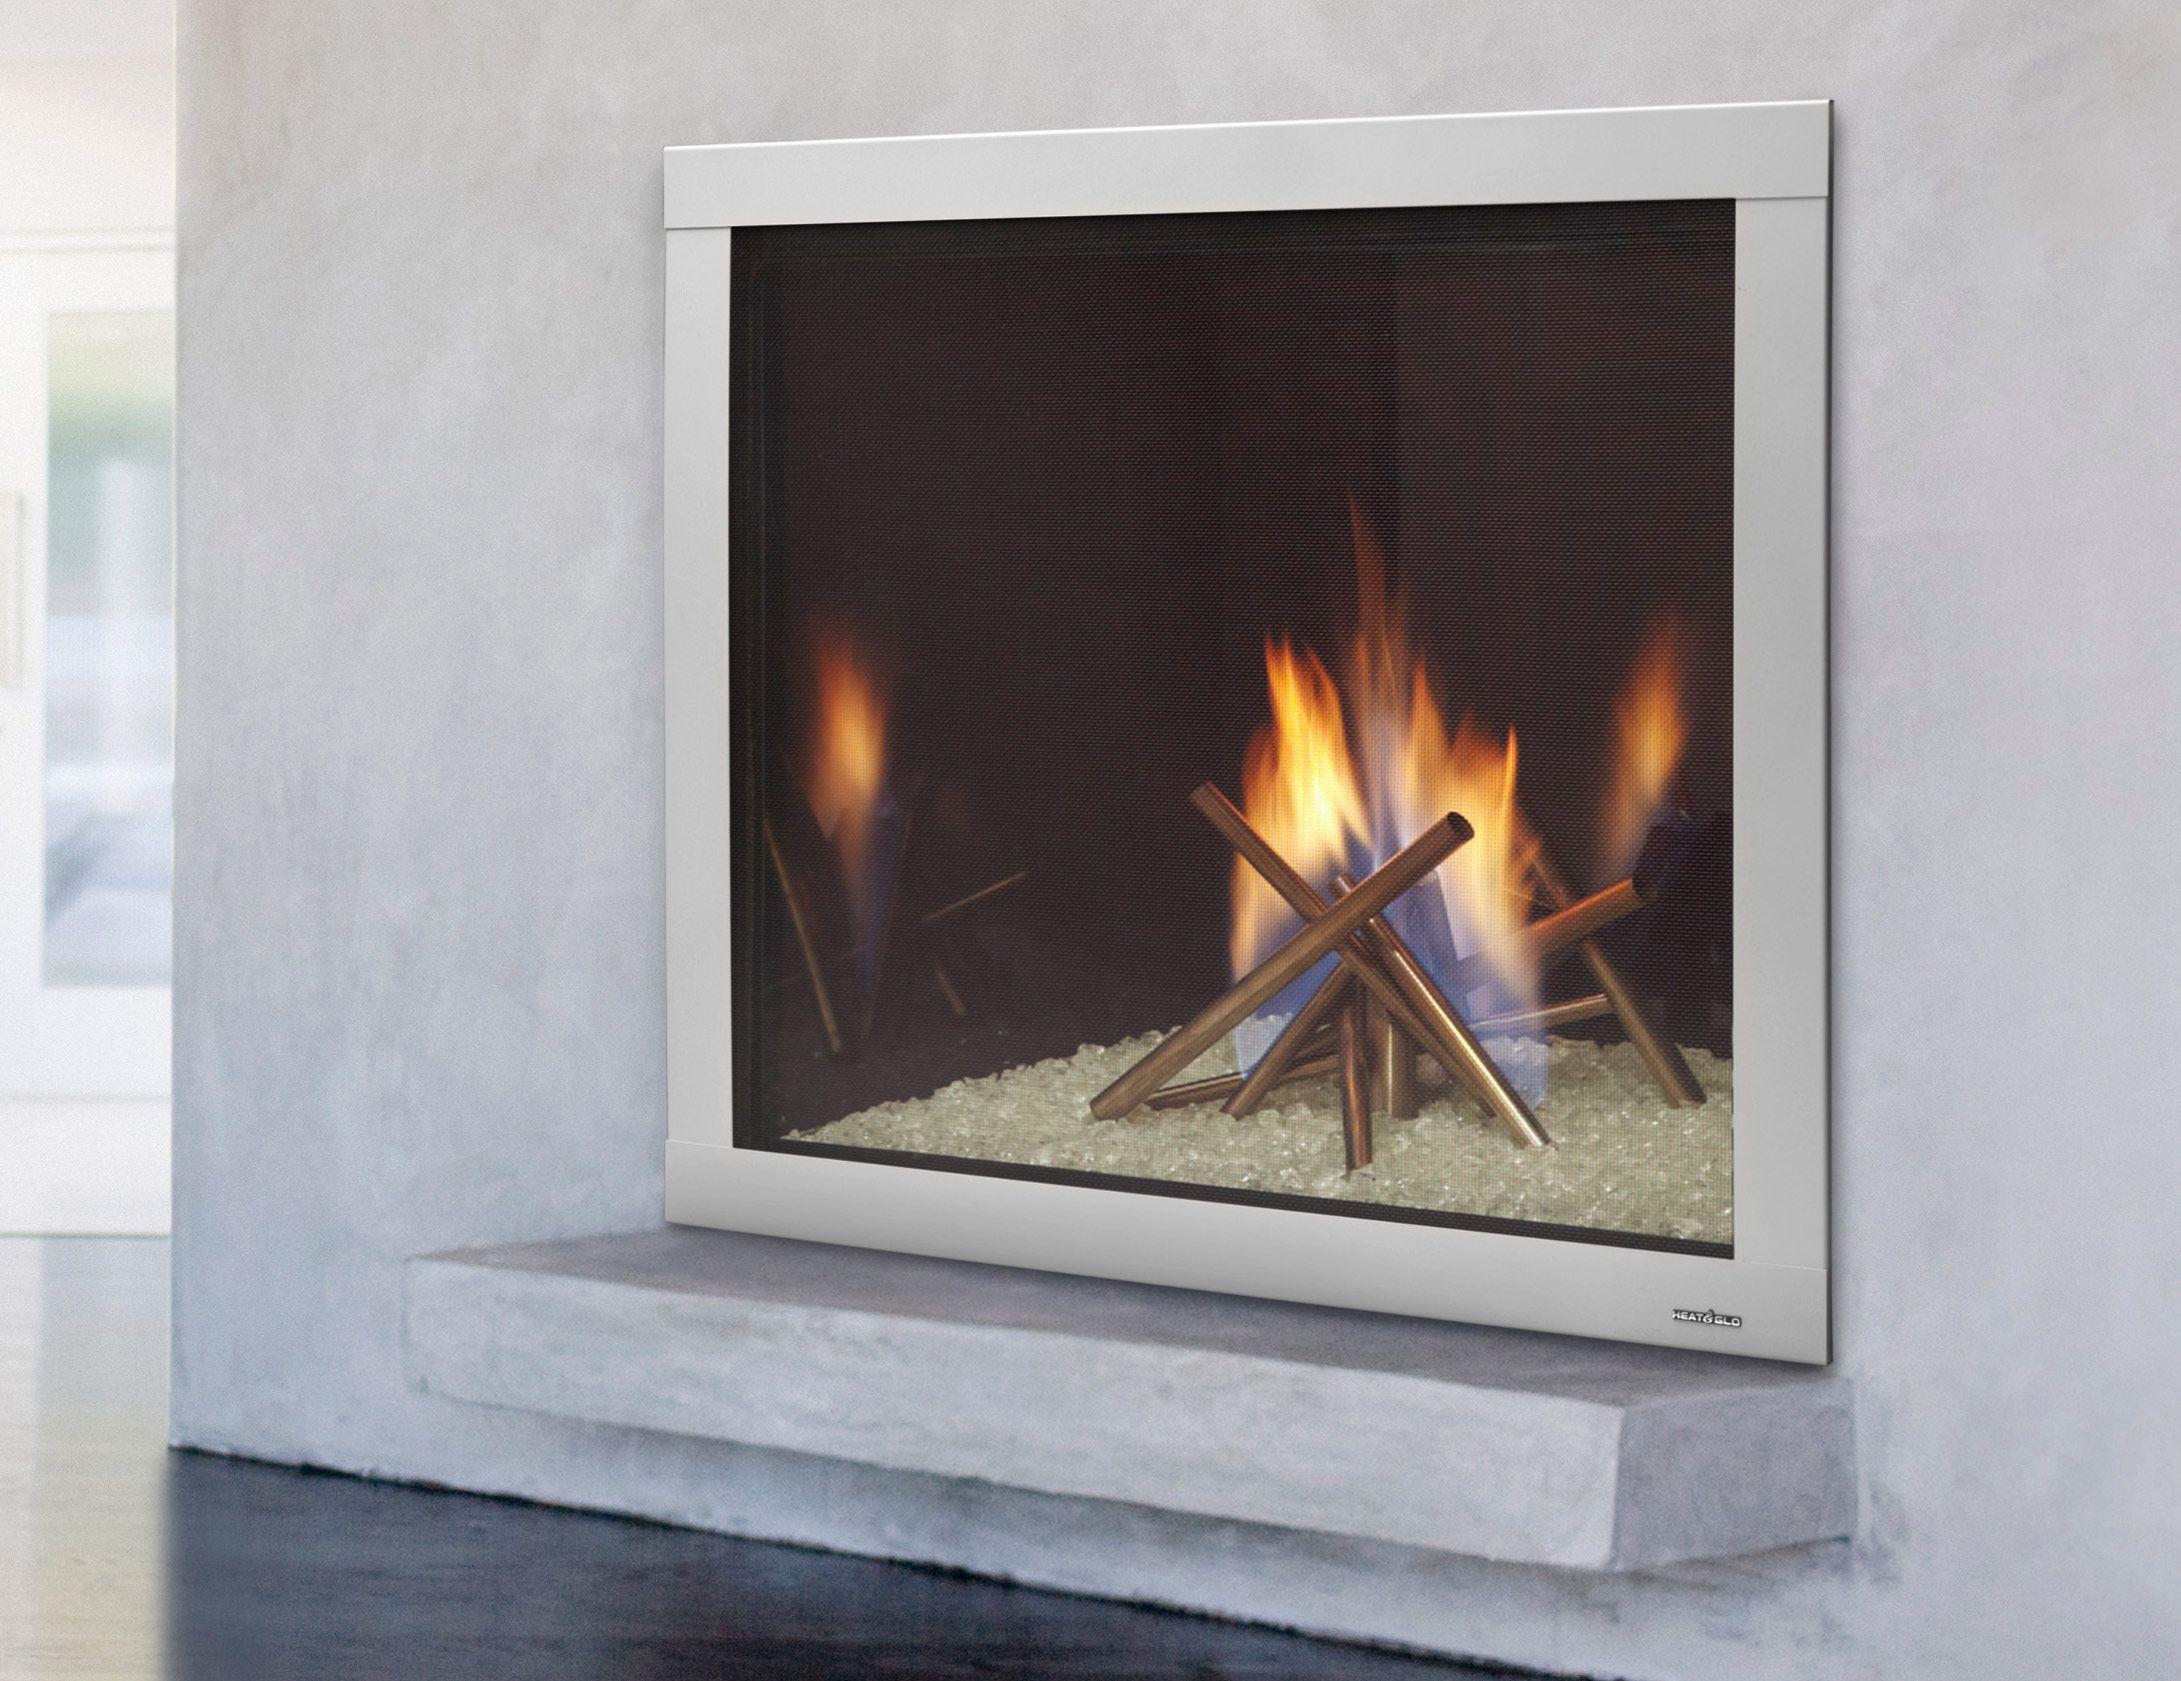 Modern Gas Fireplace Inserts Design